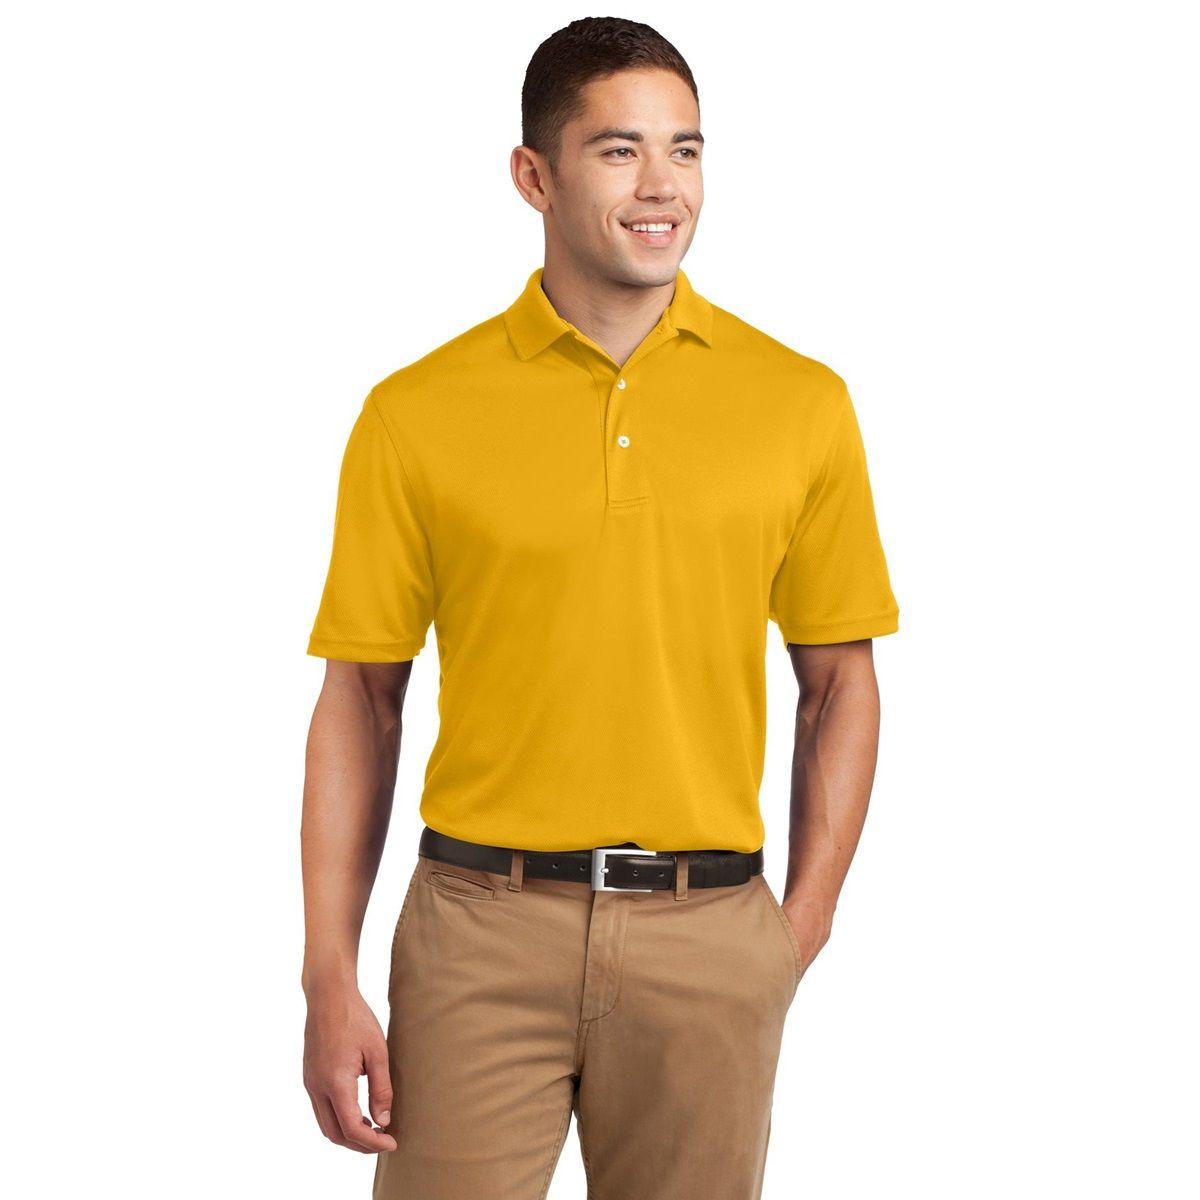 SportTek K469 DriMesh Polo Shirt Gold Polo shirt